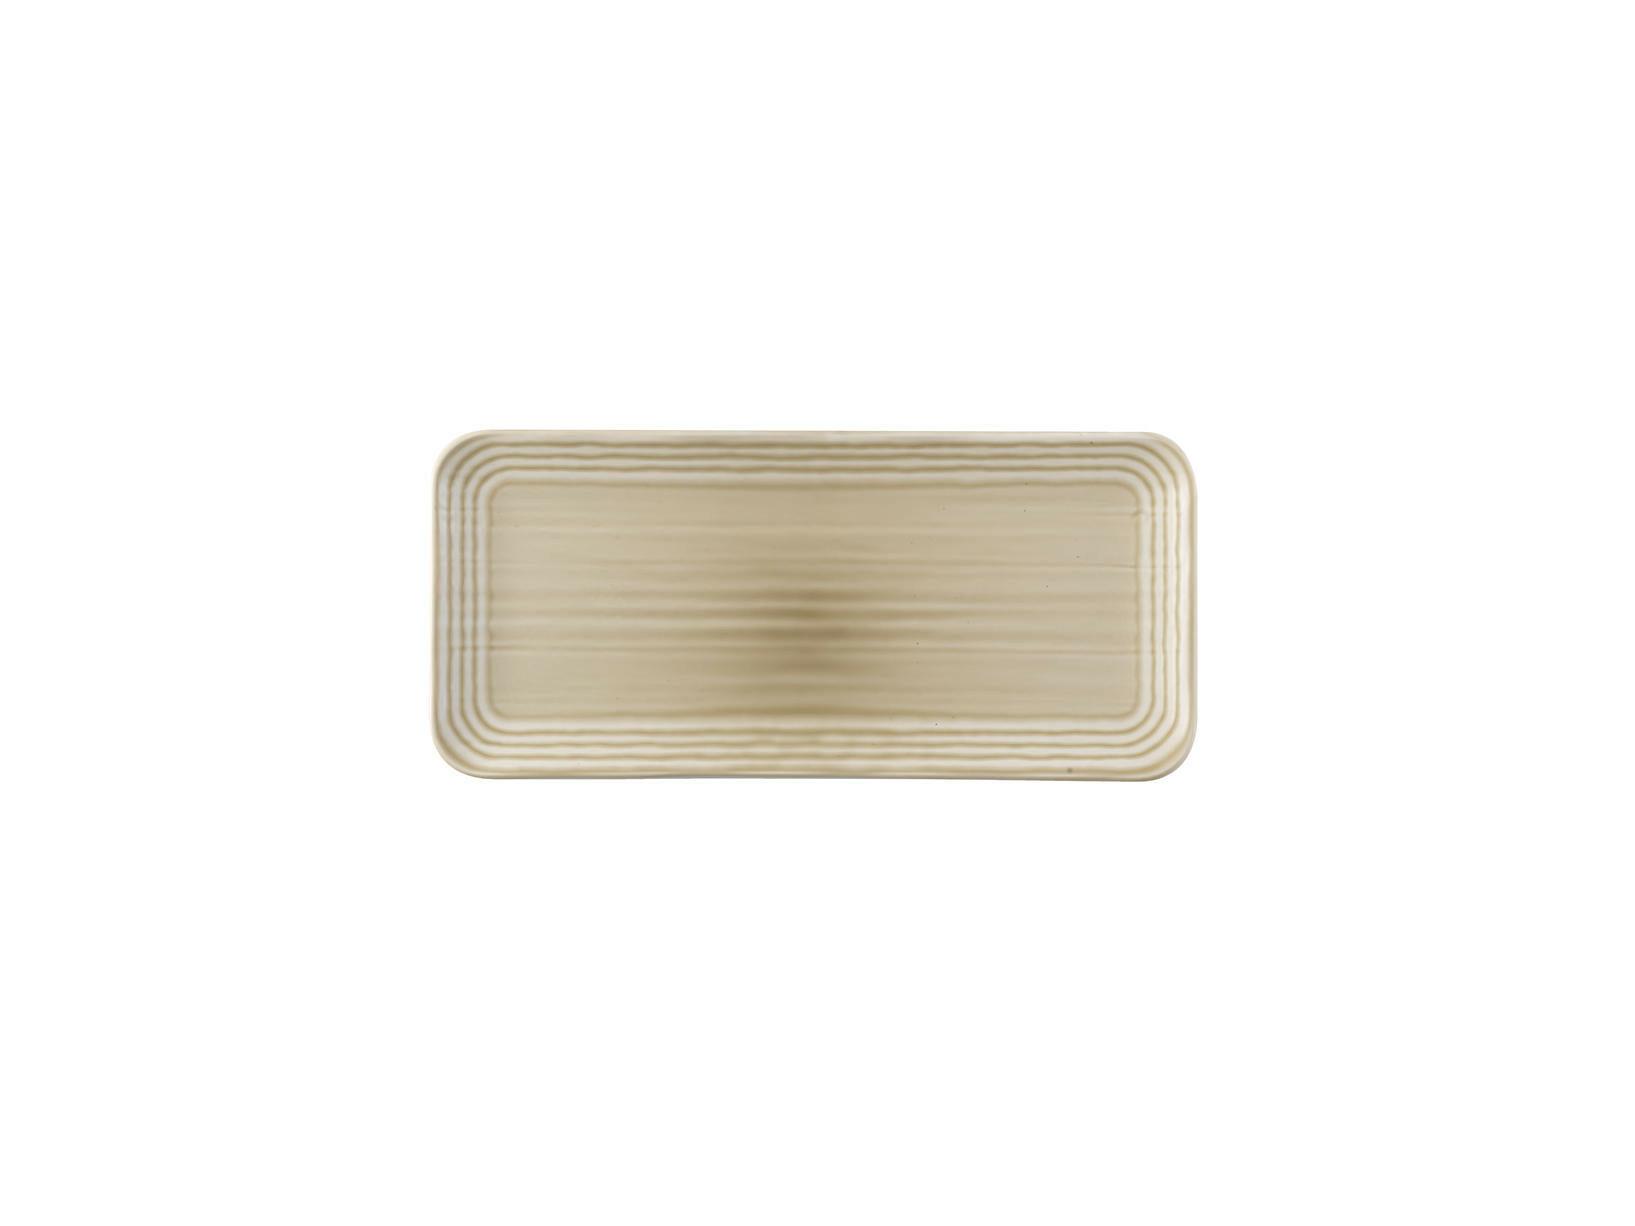 Dudson Harvest Norse Linen organic rectangular plate 34,6 x 15,6 cm